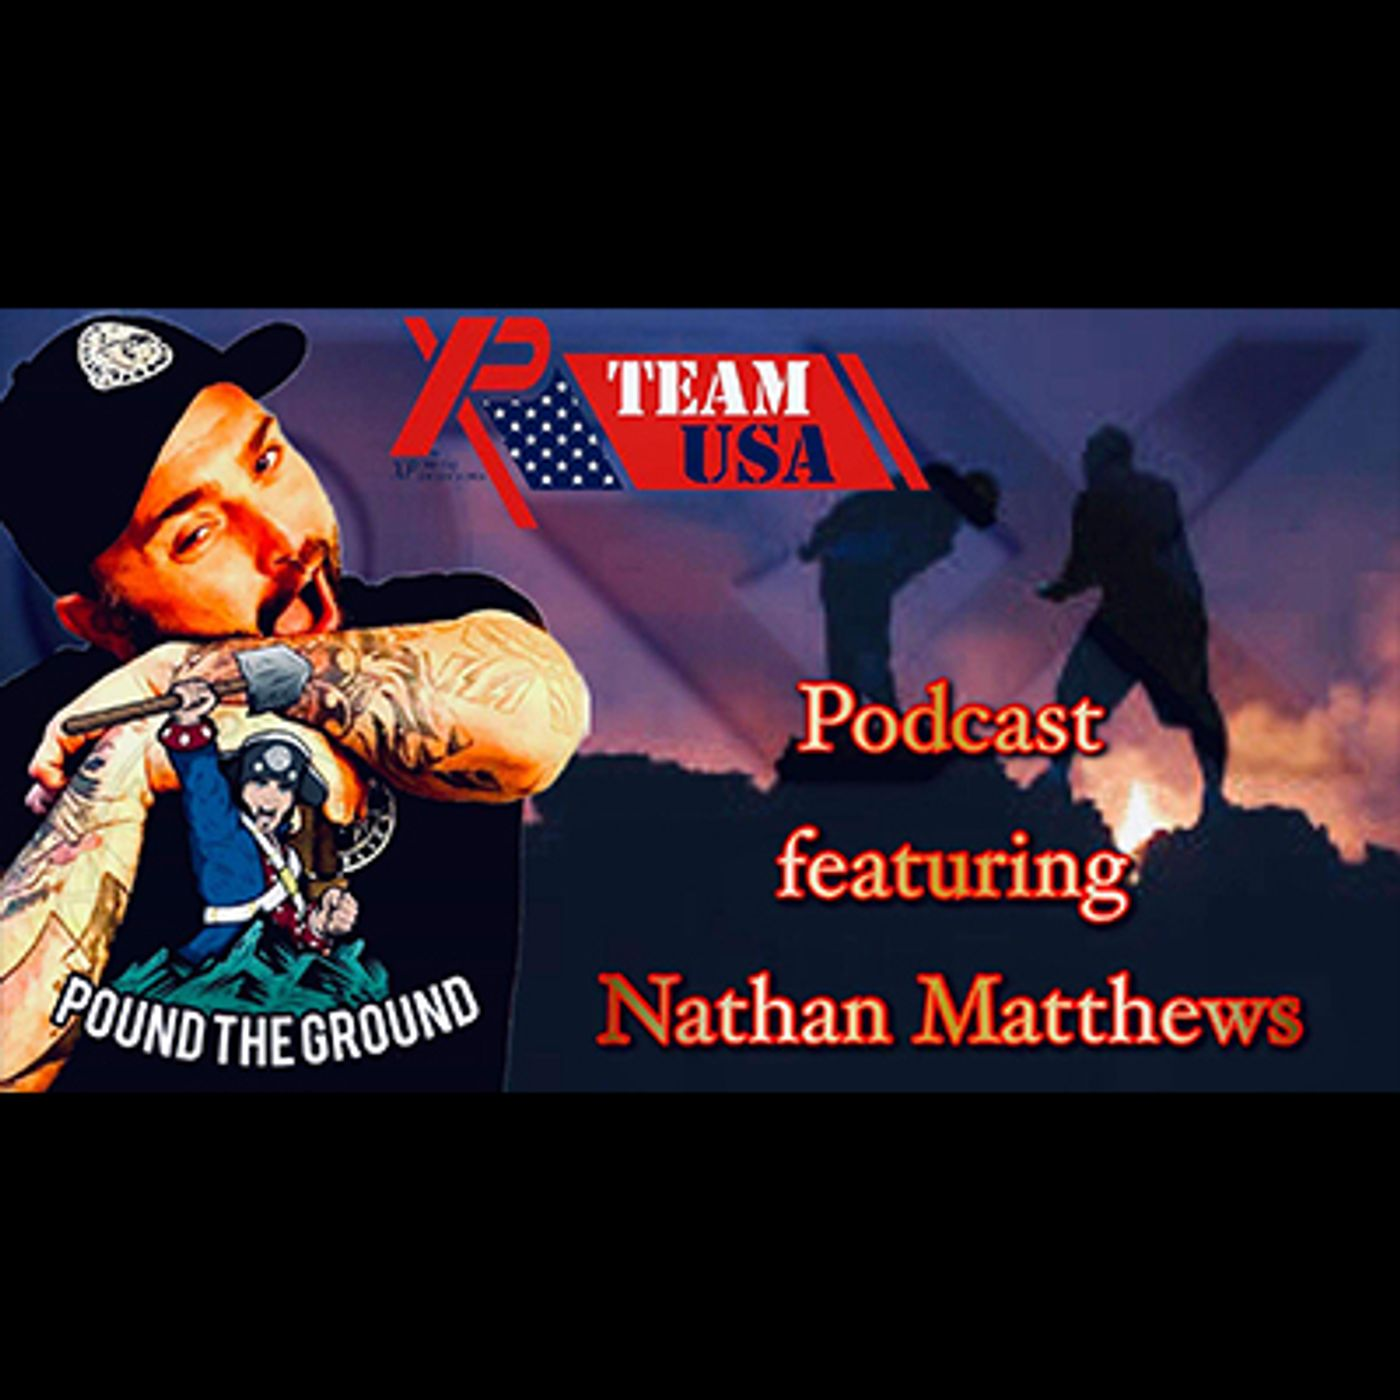 Nathan Mathews